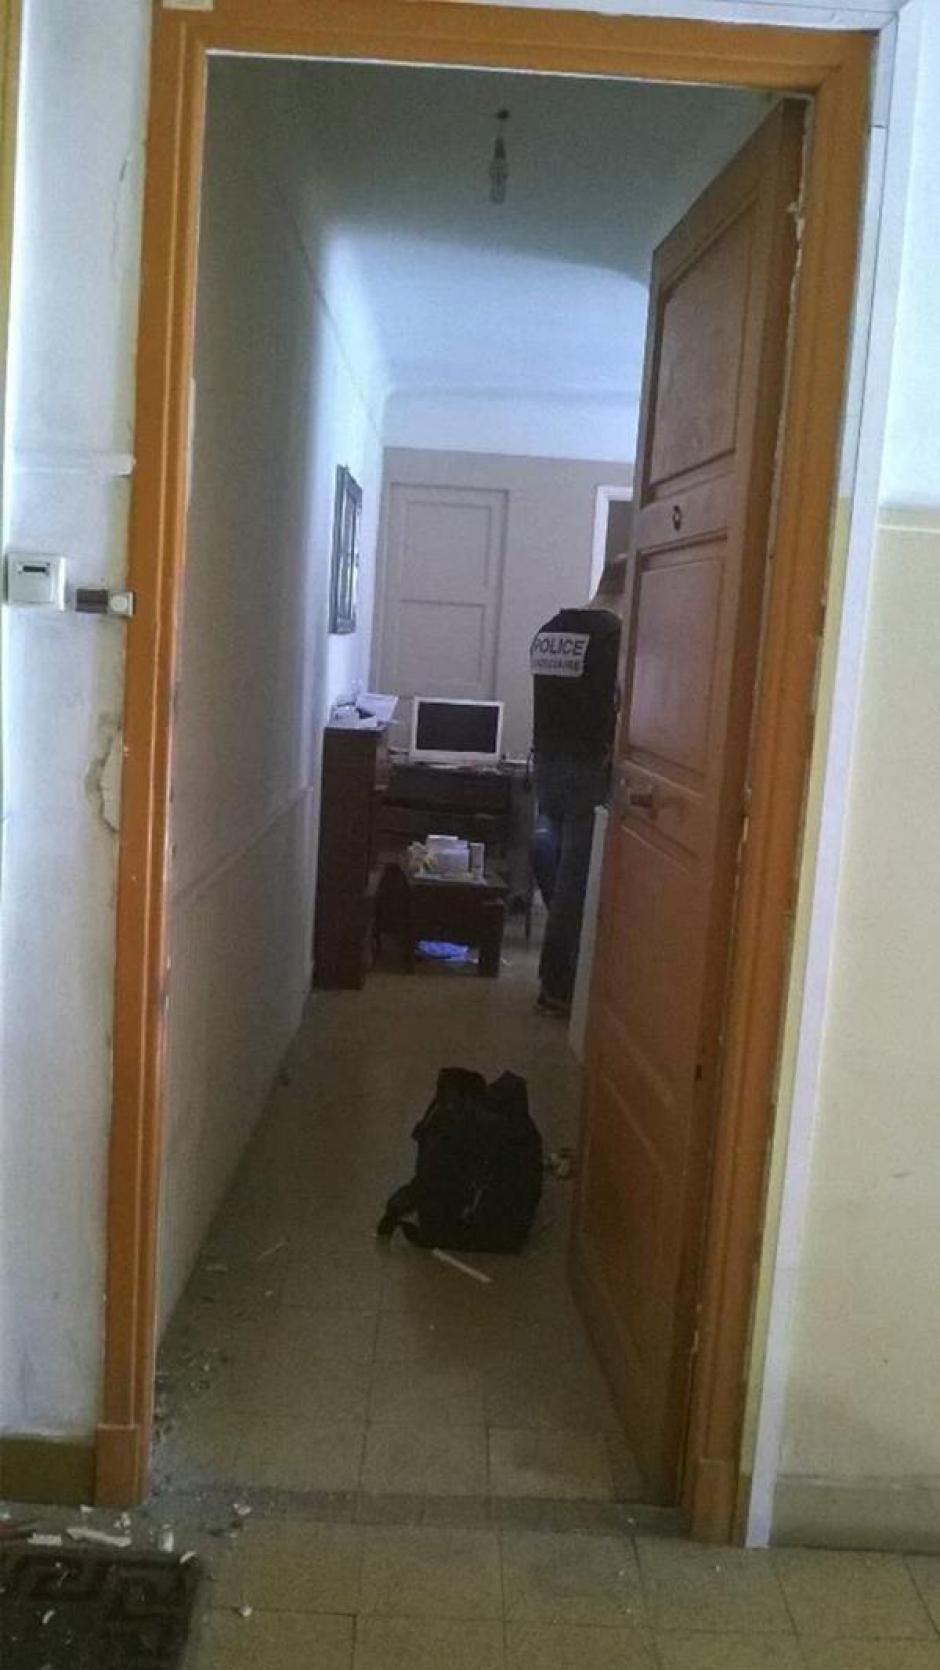 Los agentes buscaban pistas sobre qué alentó a Bouhlel a cometer la masacre. (Foto: Infobae)